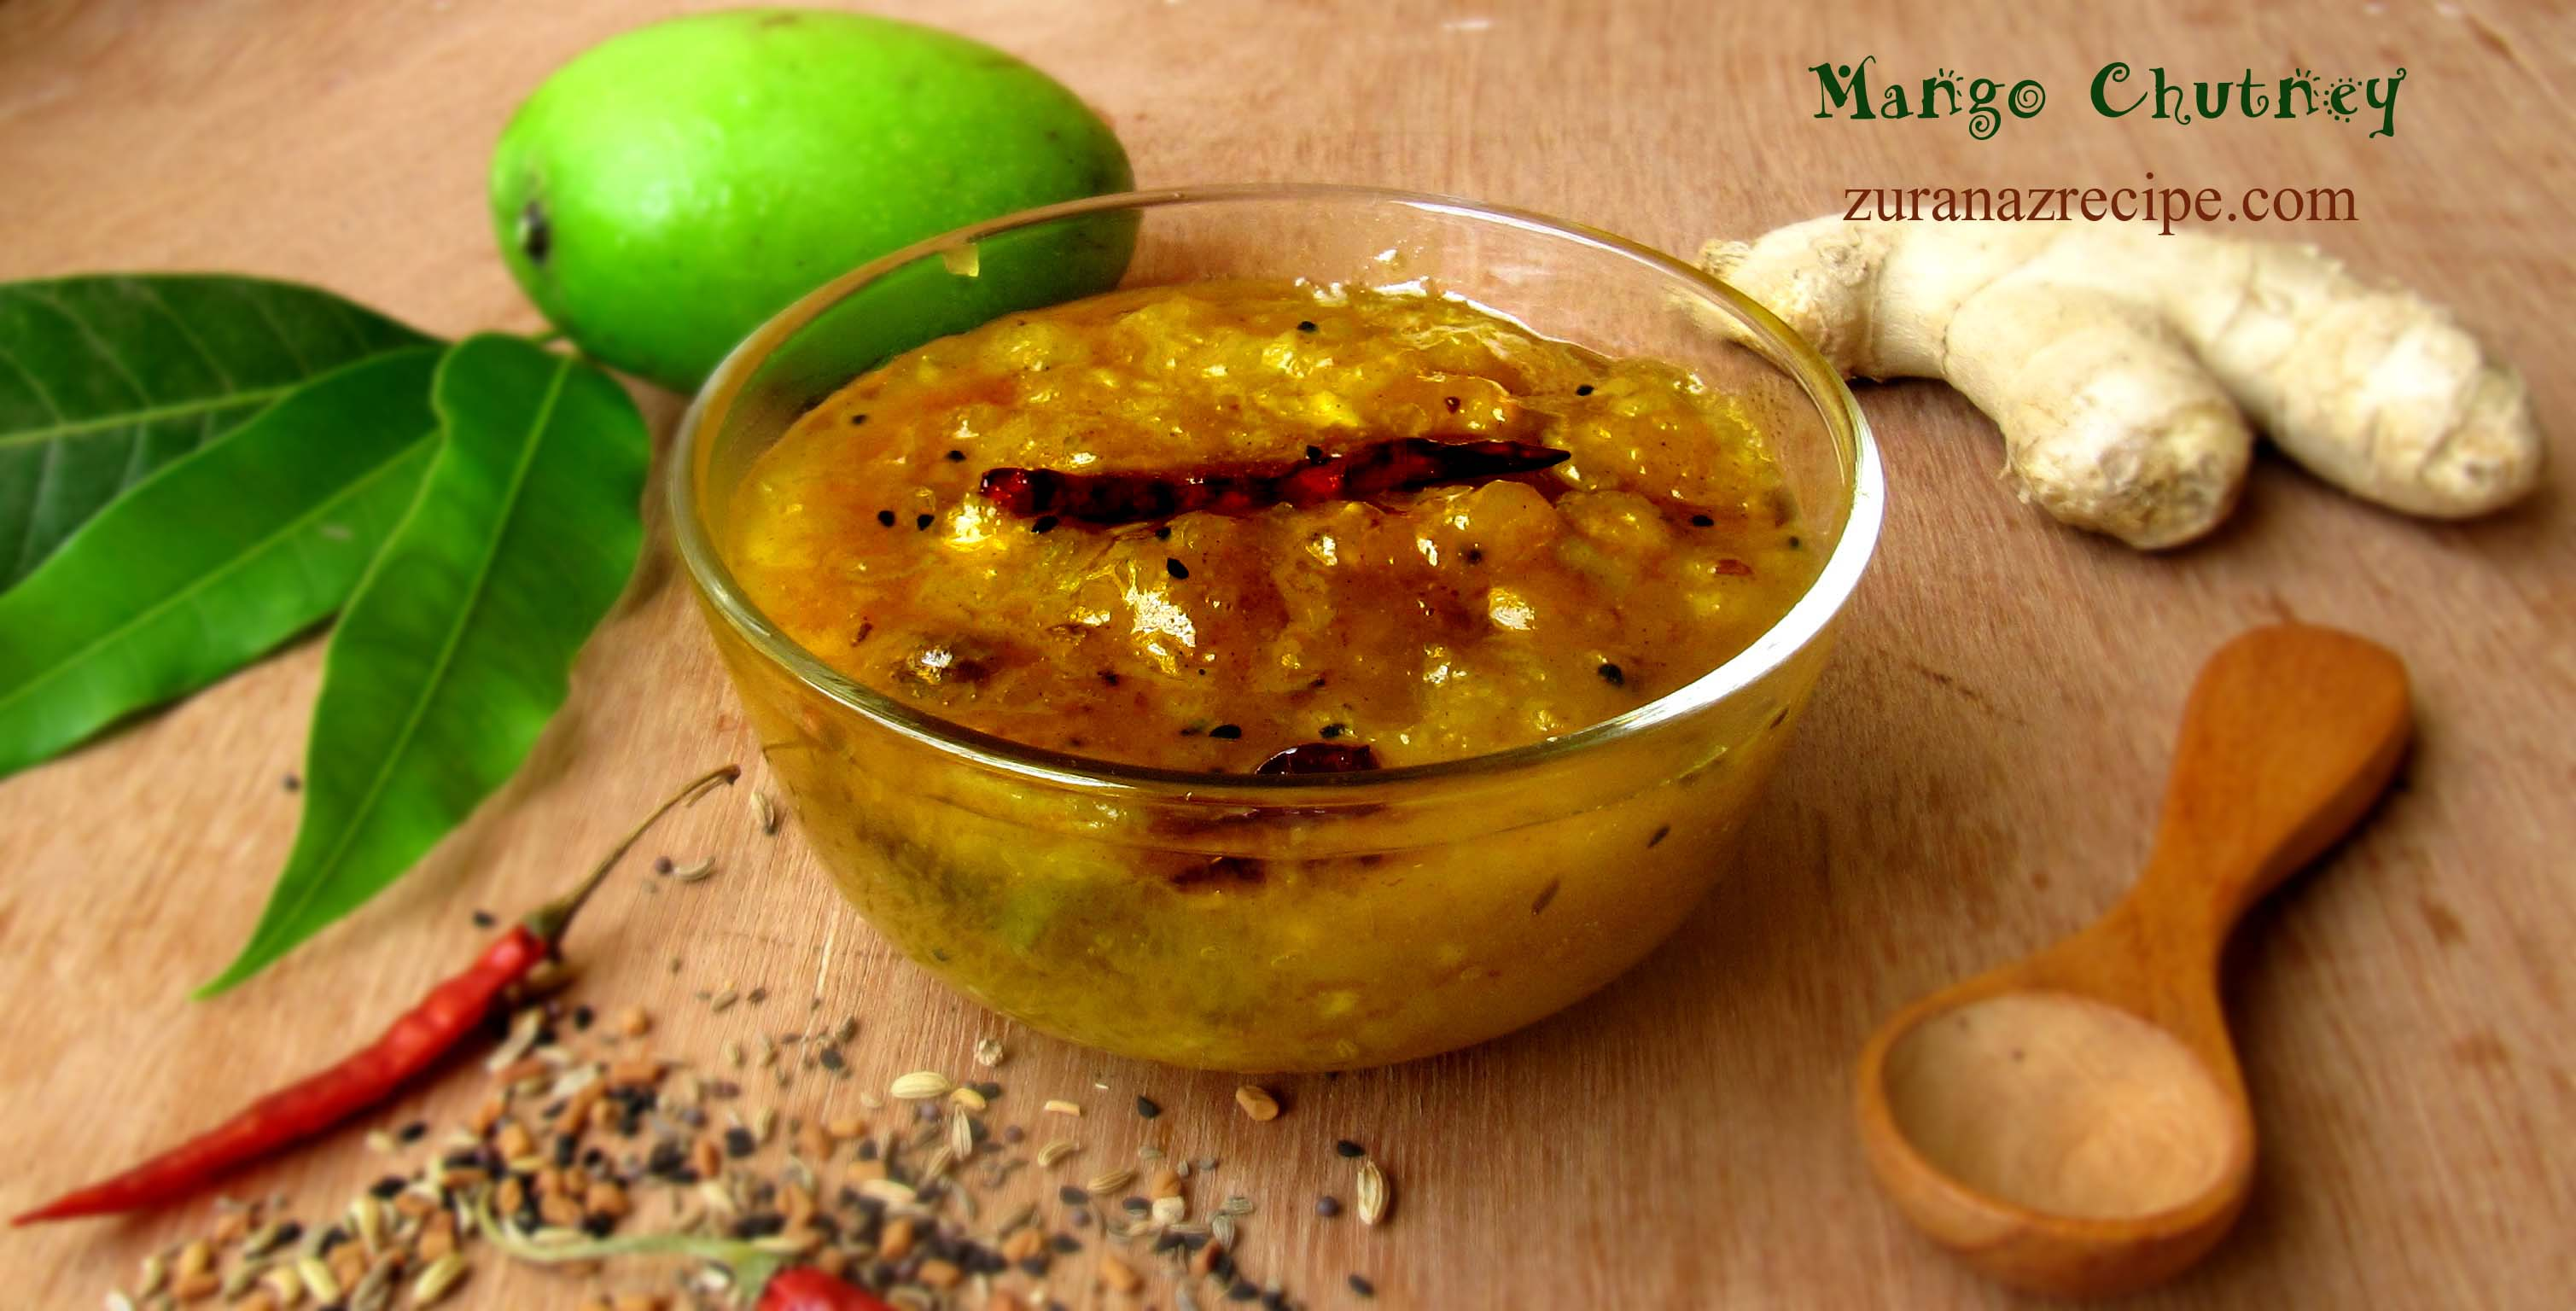 Kacha Aamer Chutney/Green Mango Chutney